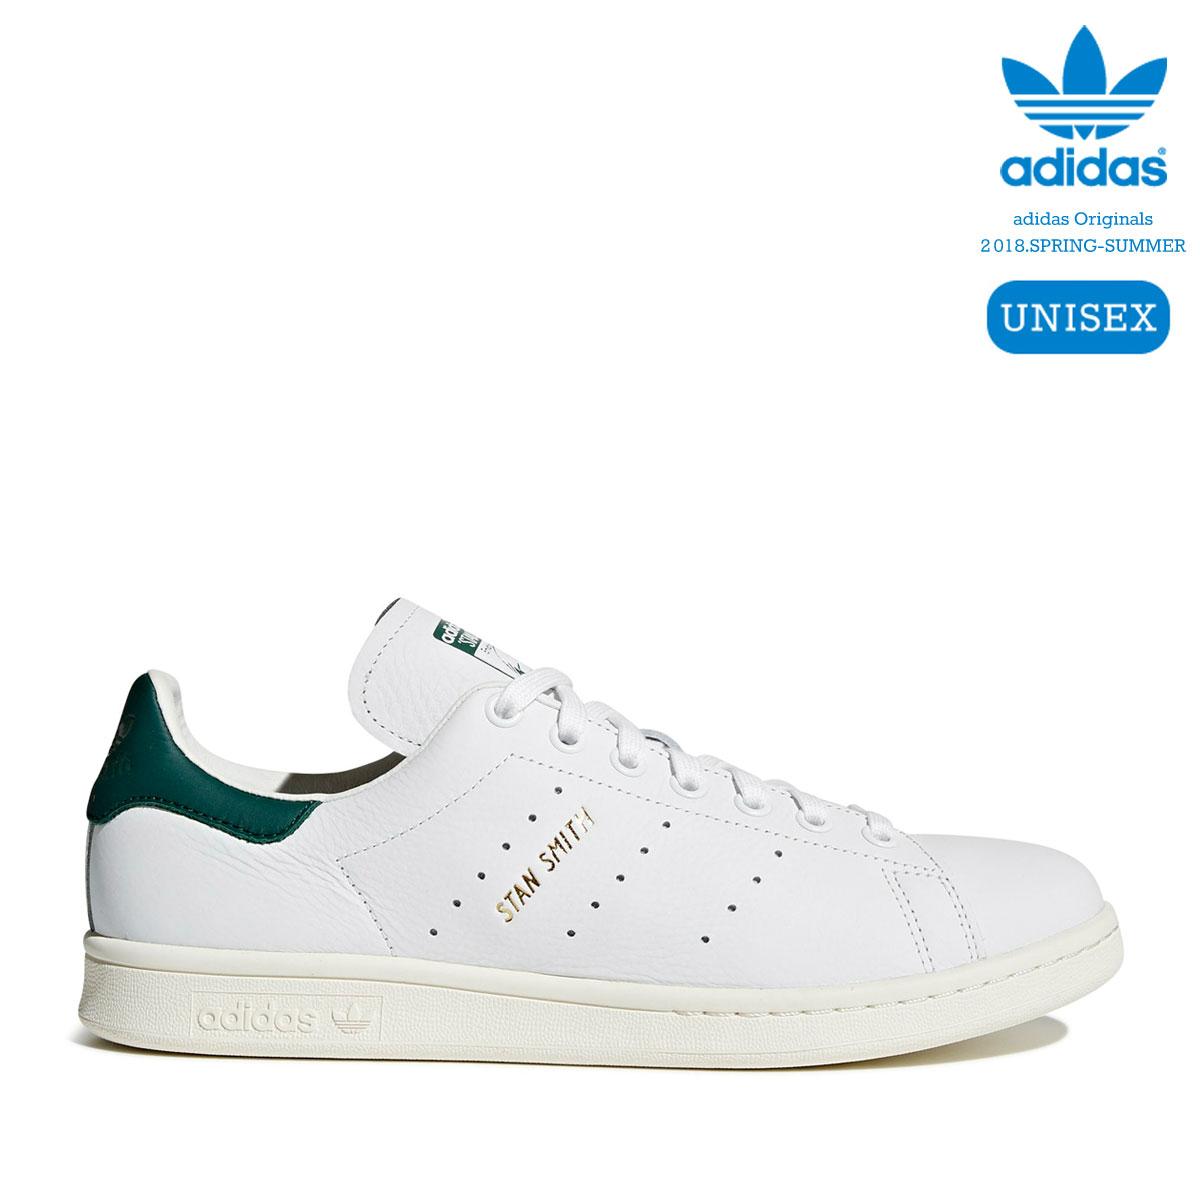 adidas Originals STAN SMITH (Running White/Running White/Collegiate Green) 【ユニセックスサイズ】【18SS-I】